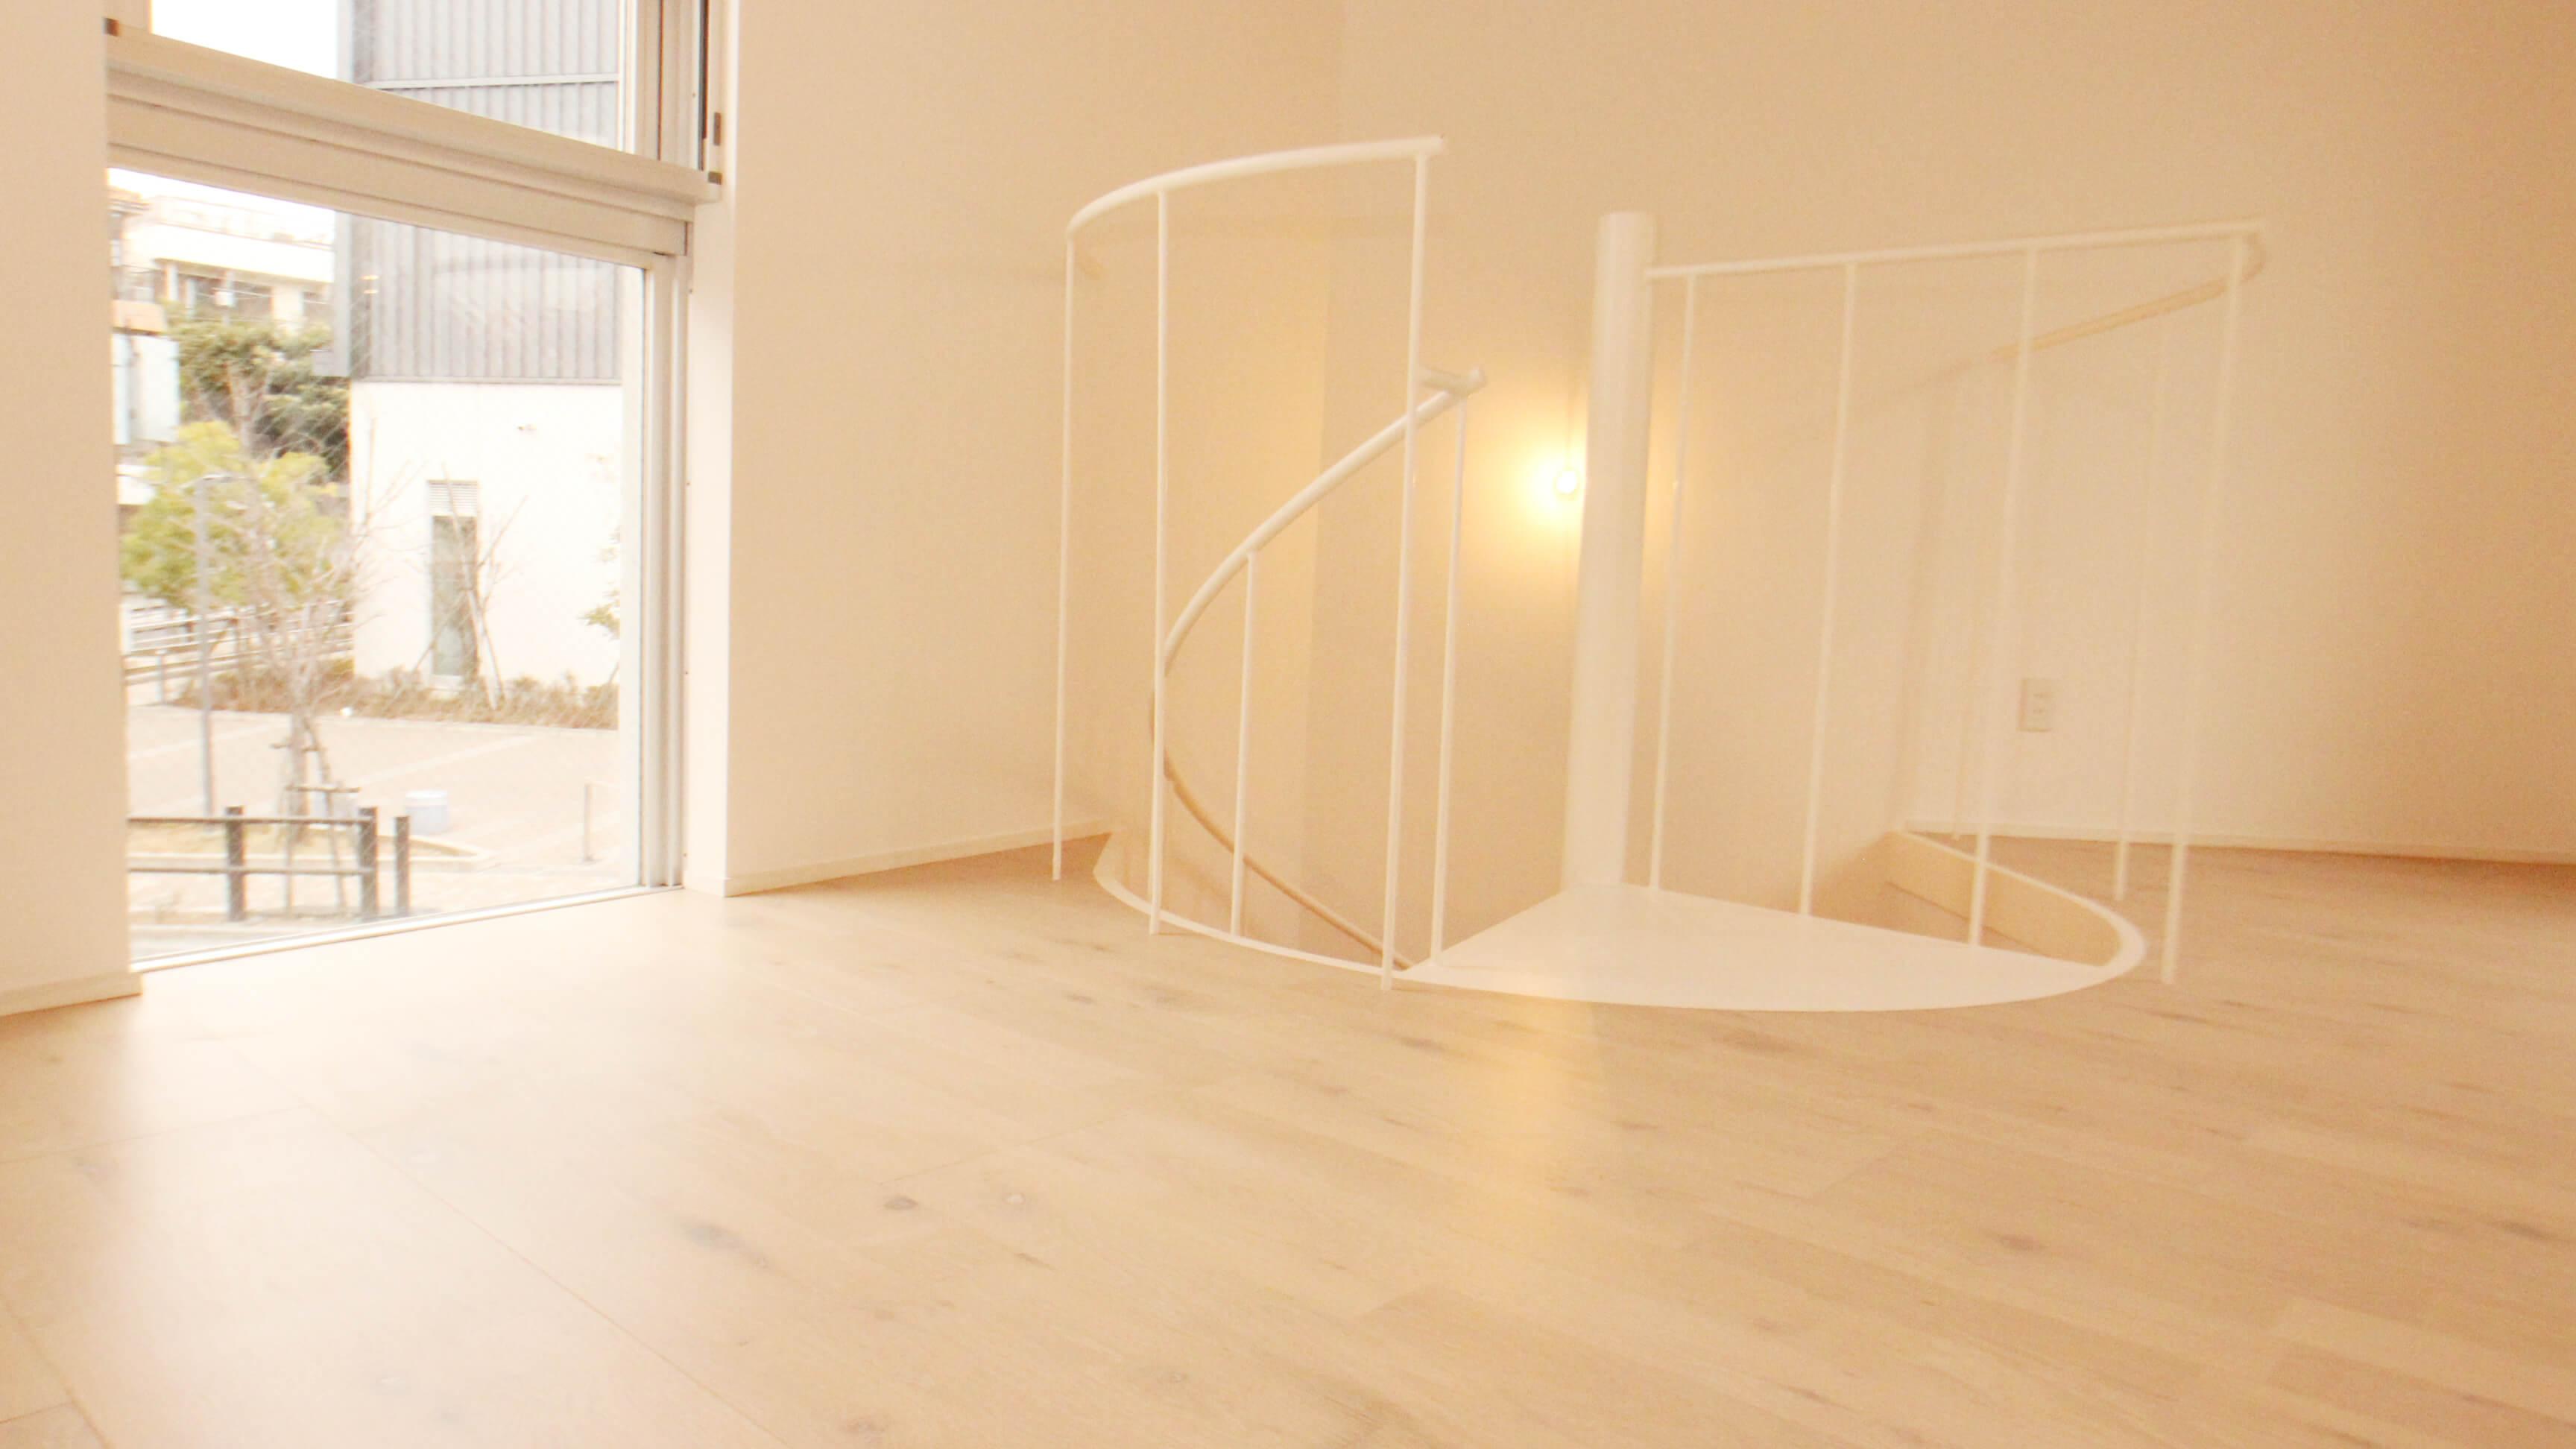 ★feel CnB★こちらは螺旋階段付き!成増駅5分・猫と暮らすデザイナーズマンション